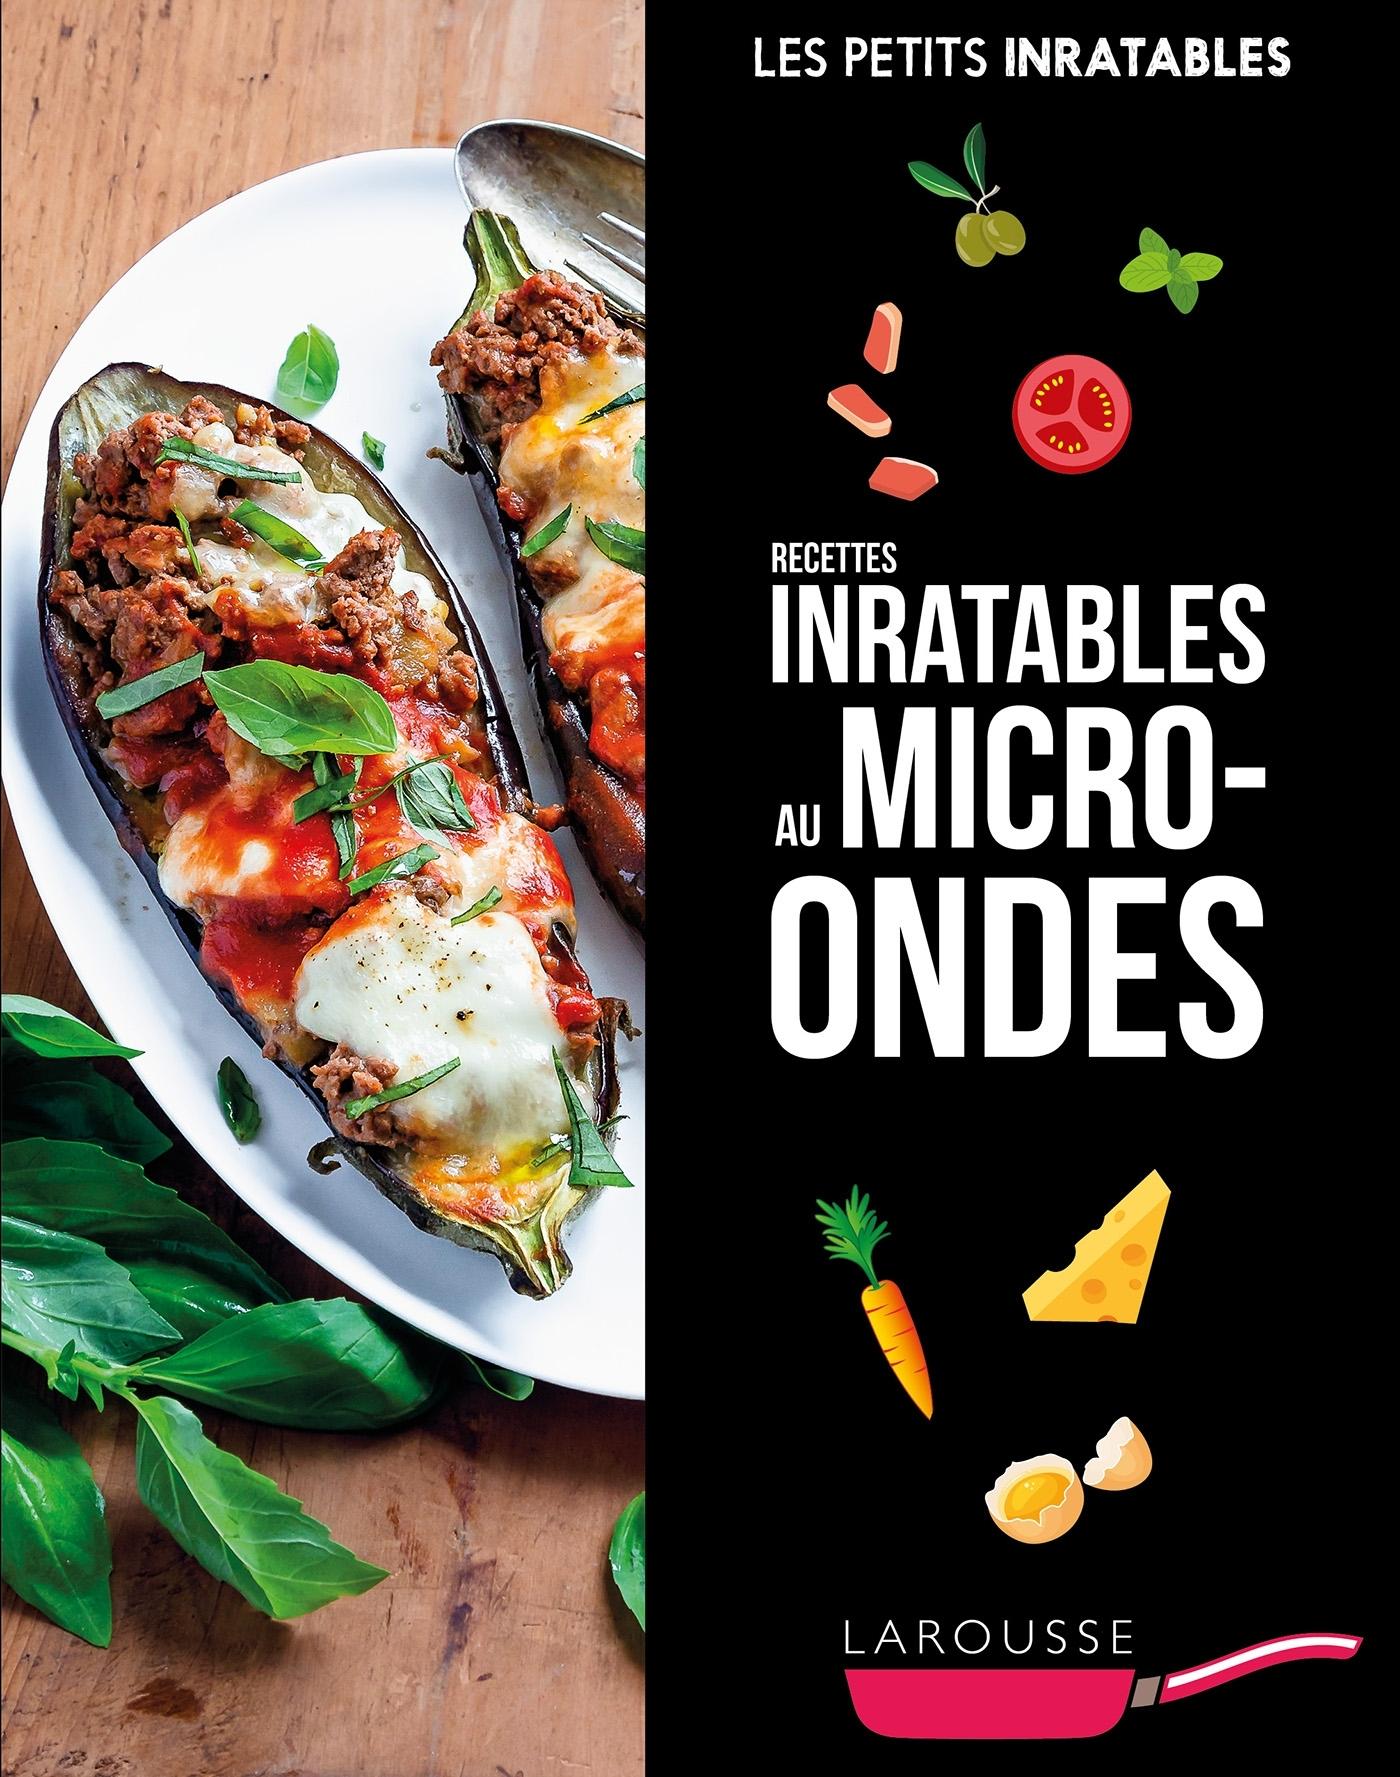 RECETTES INRATABLES AU MICRO-ONDES